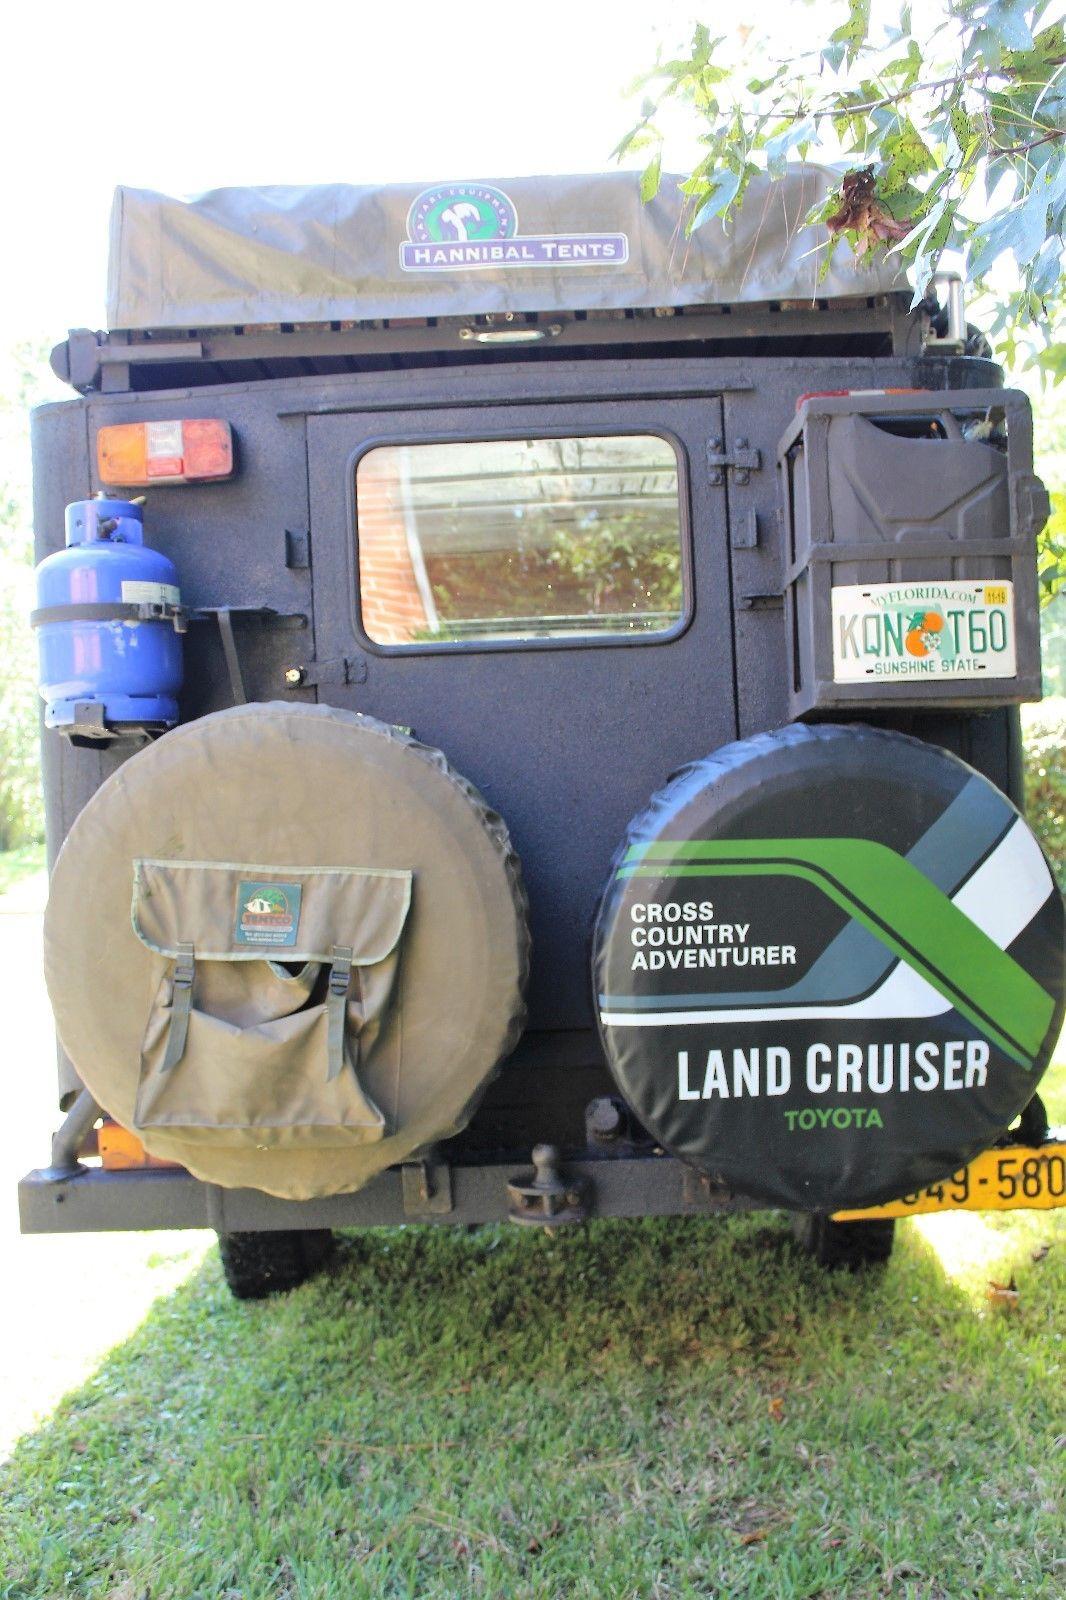 Toyota Land Cruiser Troopy cruiser fj45 fj40